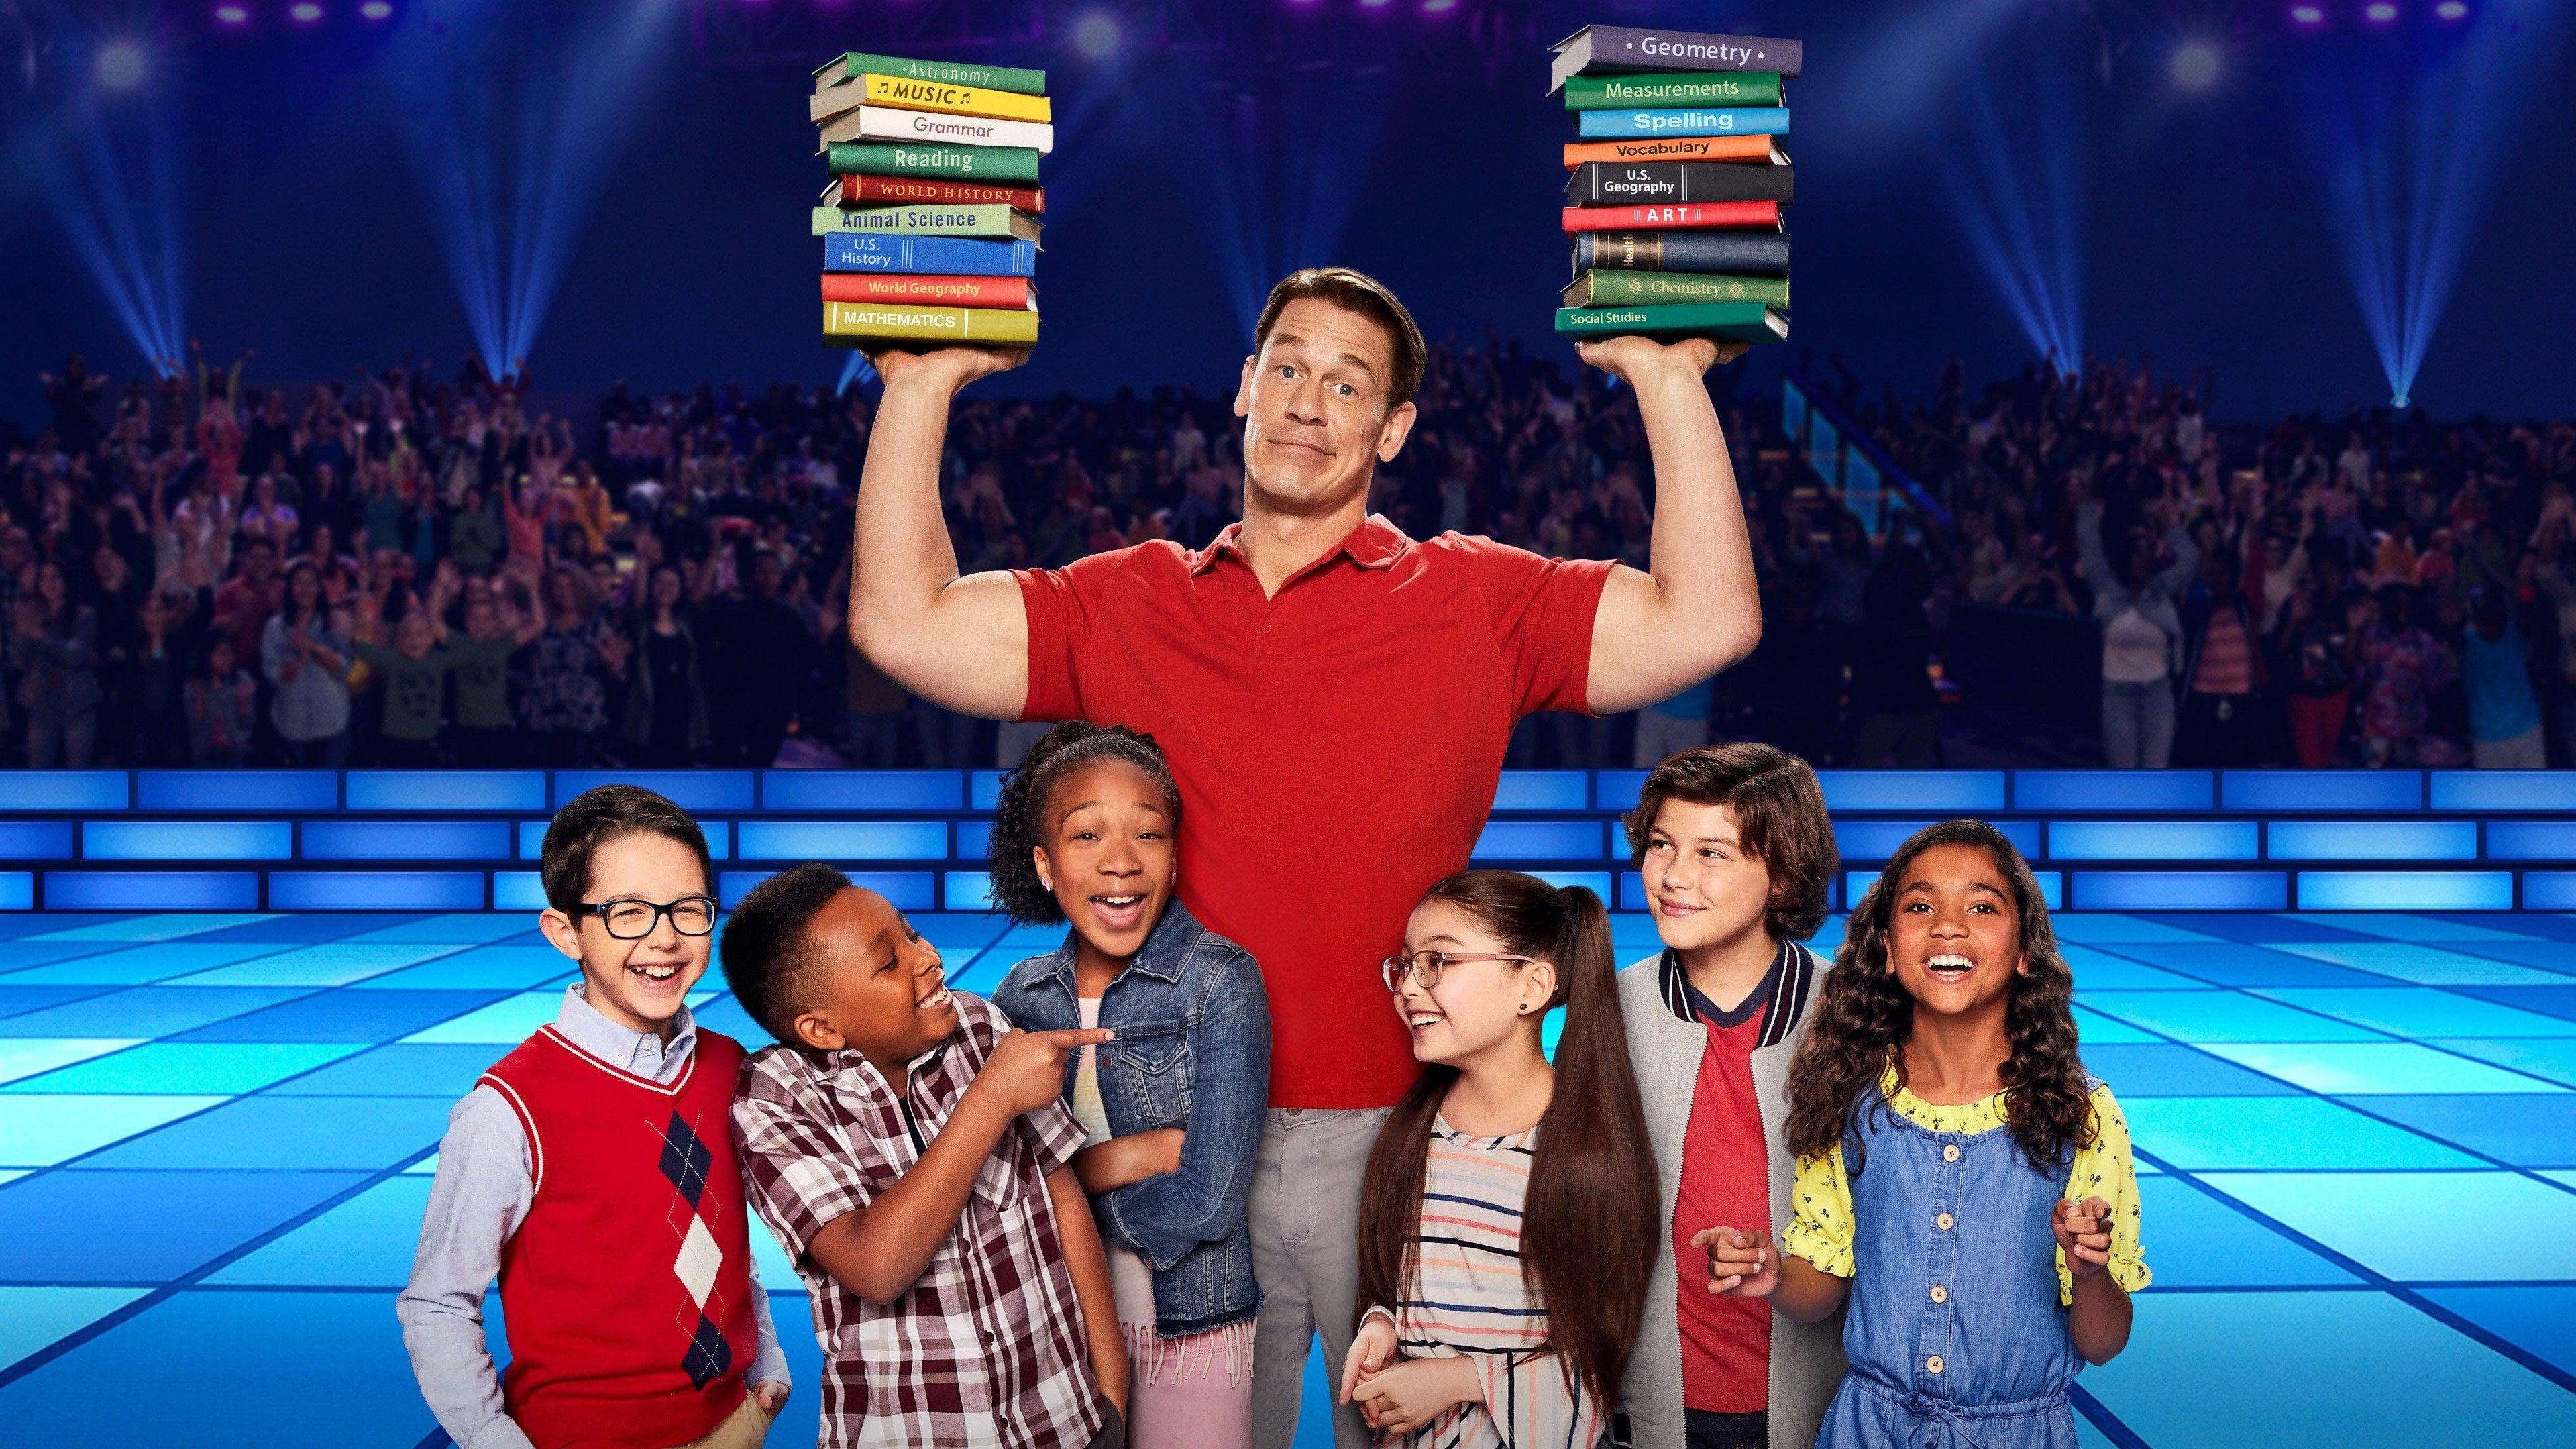 Are You Smarter Than a 5th Grader - Season 1